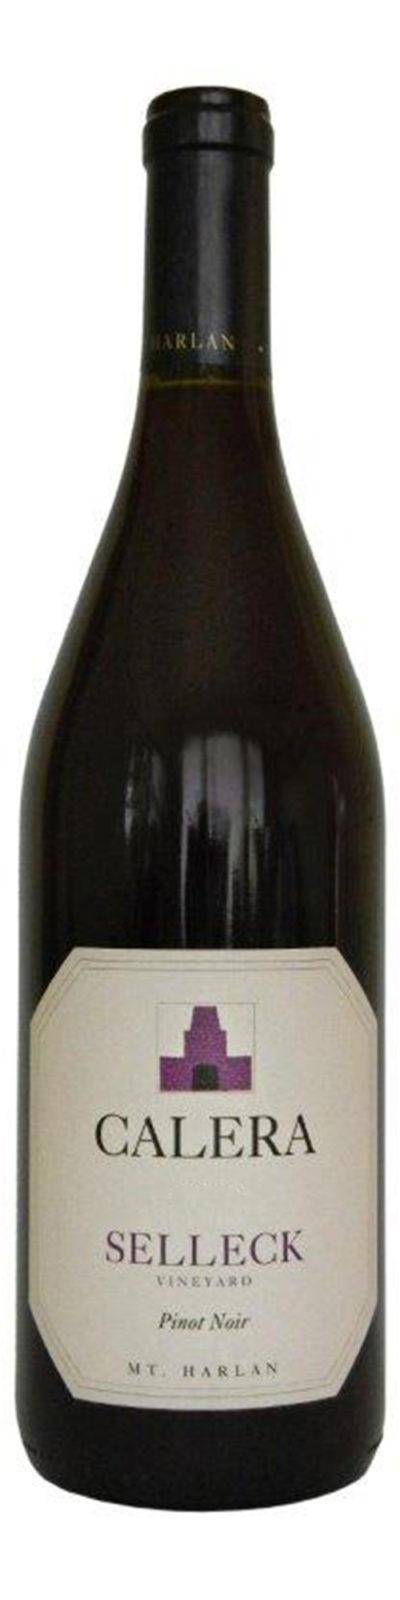 Calera Mt Harlan Selleck Pinot Noir